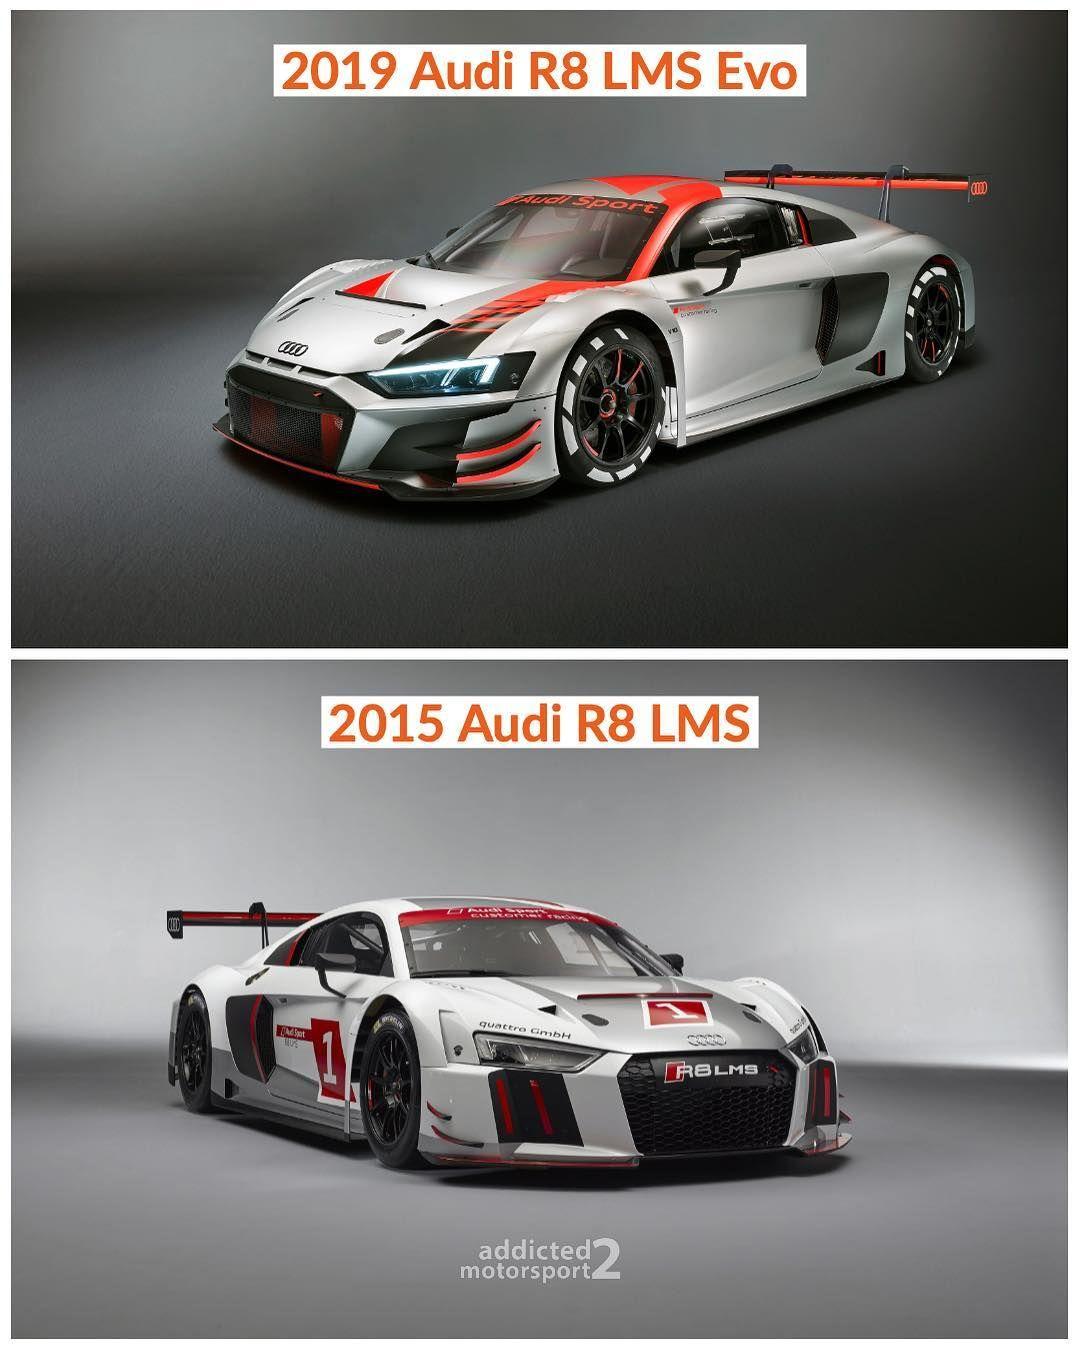 Bose 2019 Audi R8 Lms Evo Fotos Infos Hot Cars Audi R8 Audi